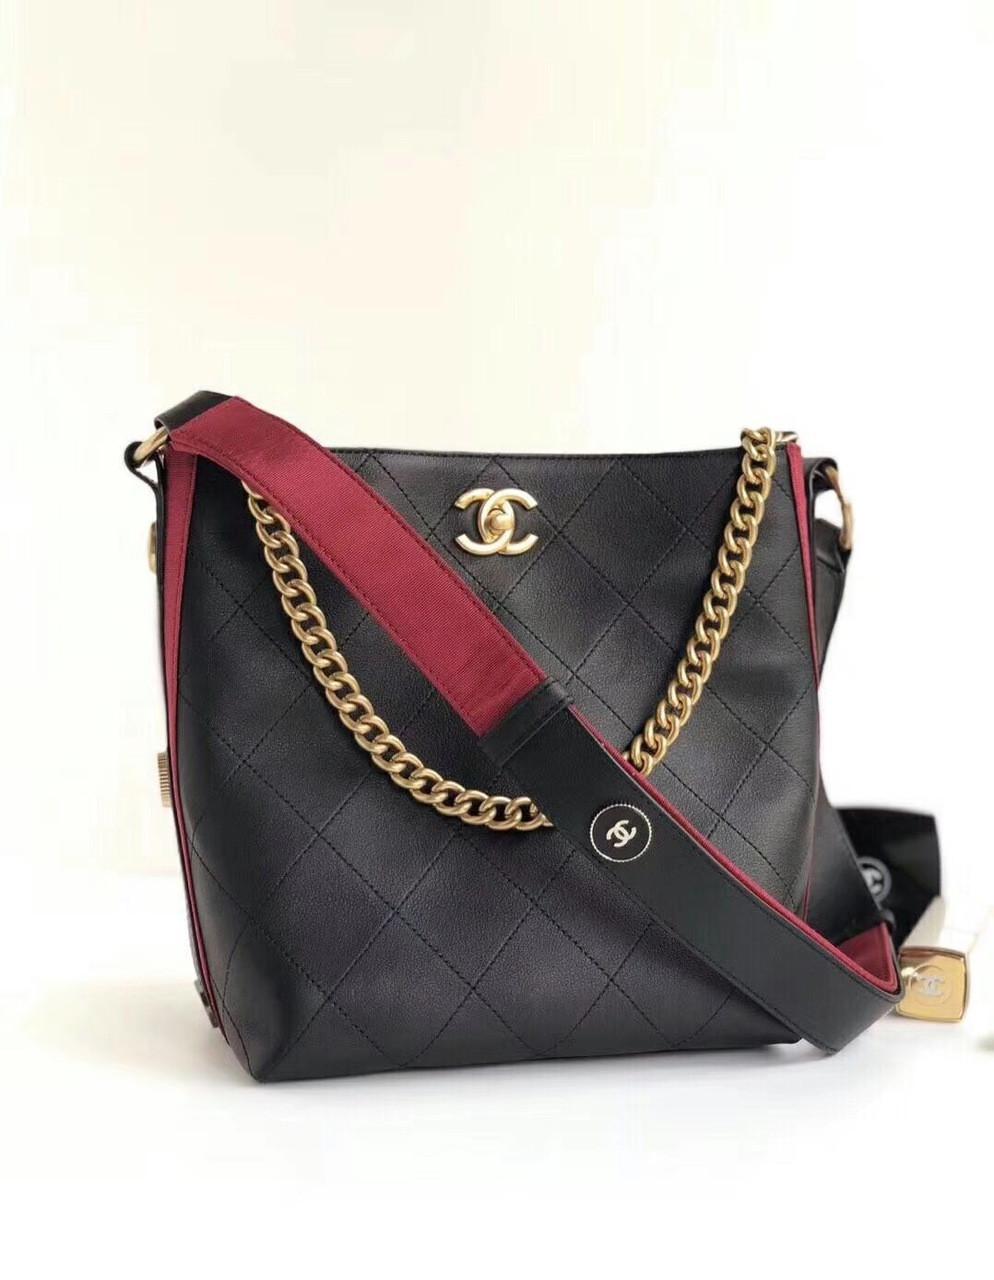 a07d6b7a4 Chanel Calfskin Botton Up Hobo Bag Black A57573 - Bella Vita Moda